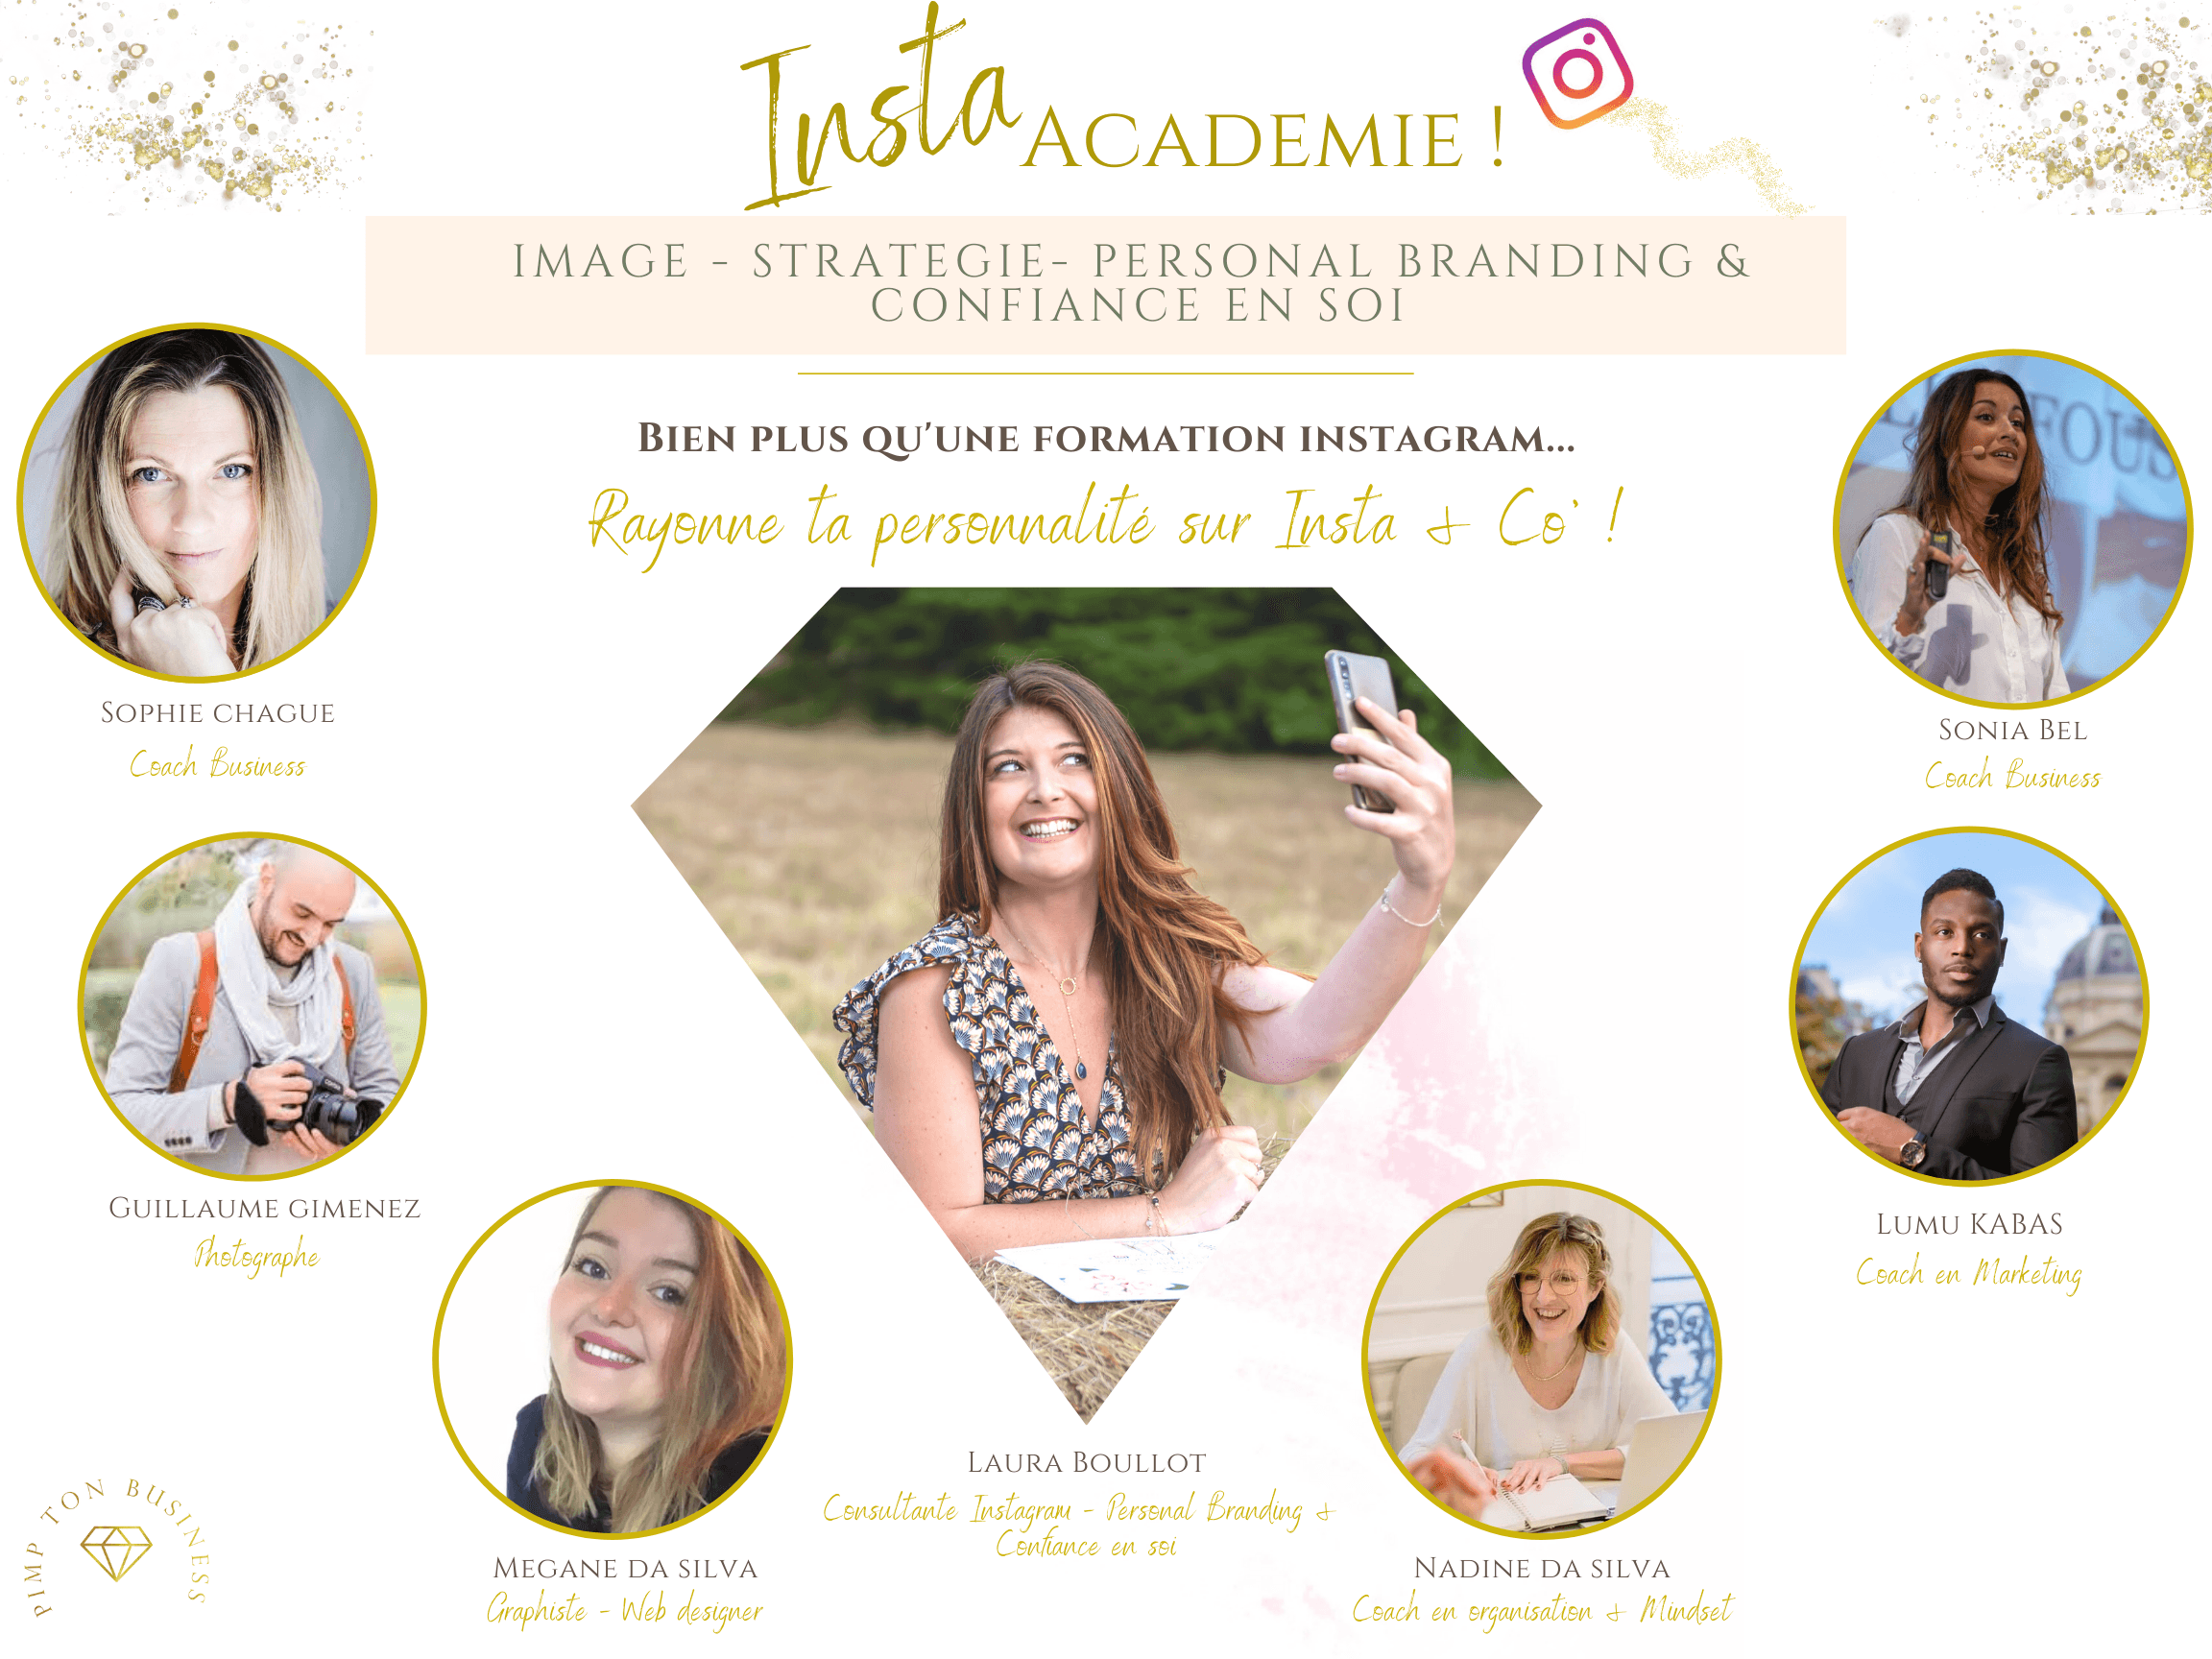 L'INSTA ACADEMIE ! (Académie INSTAGRAM)